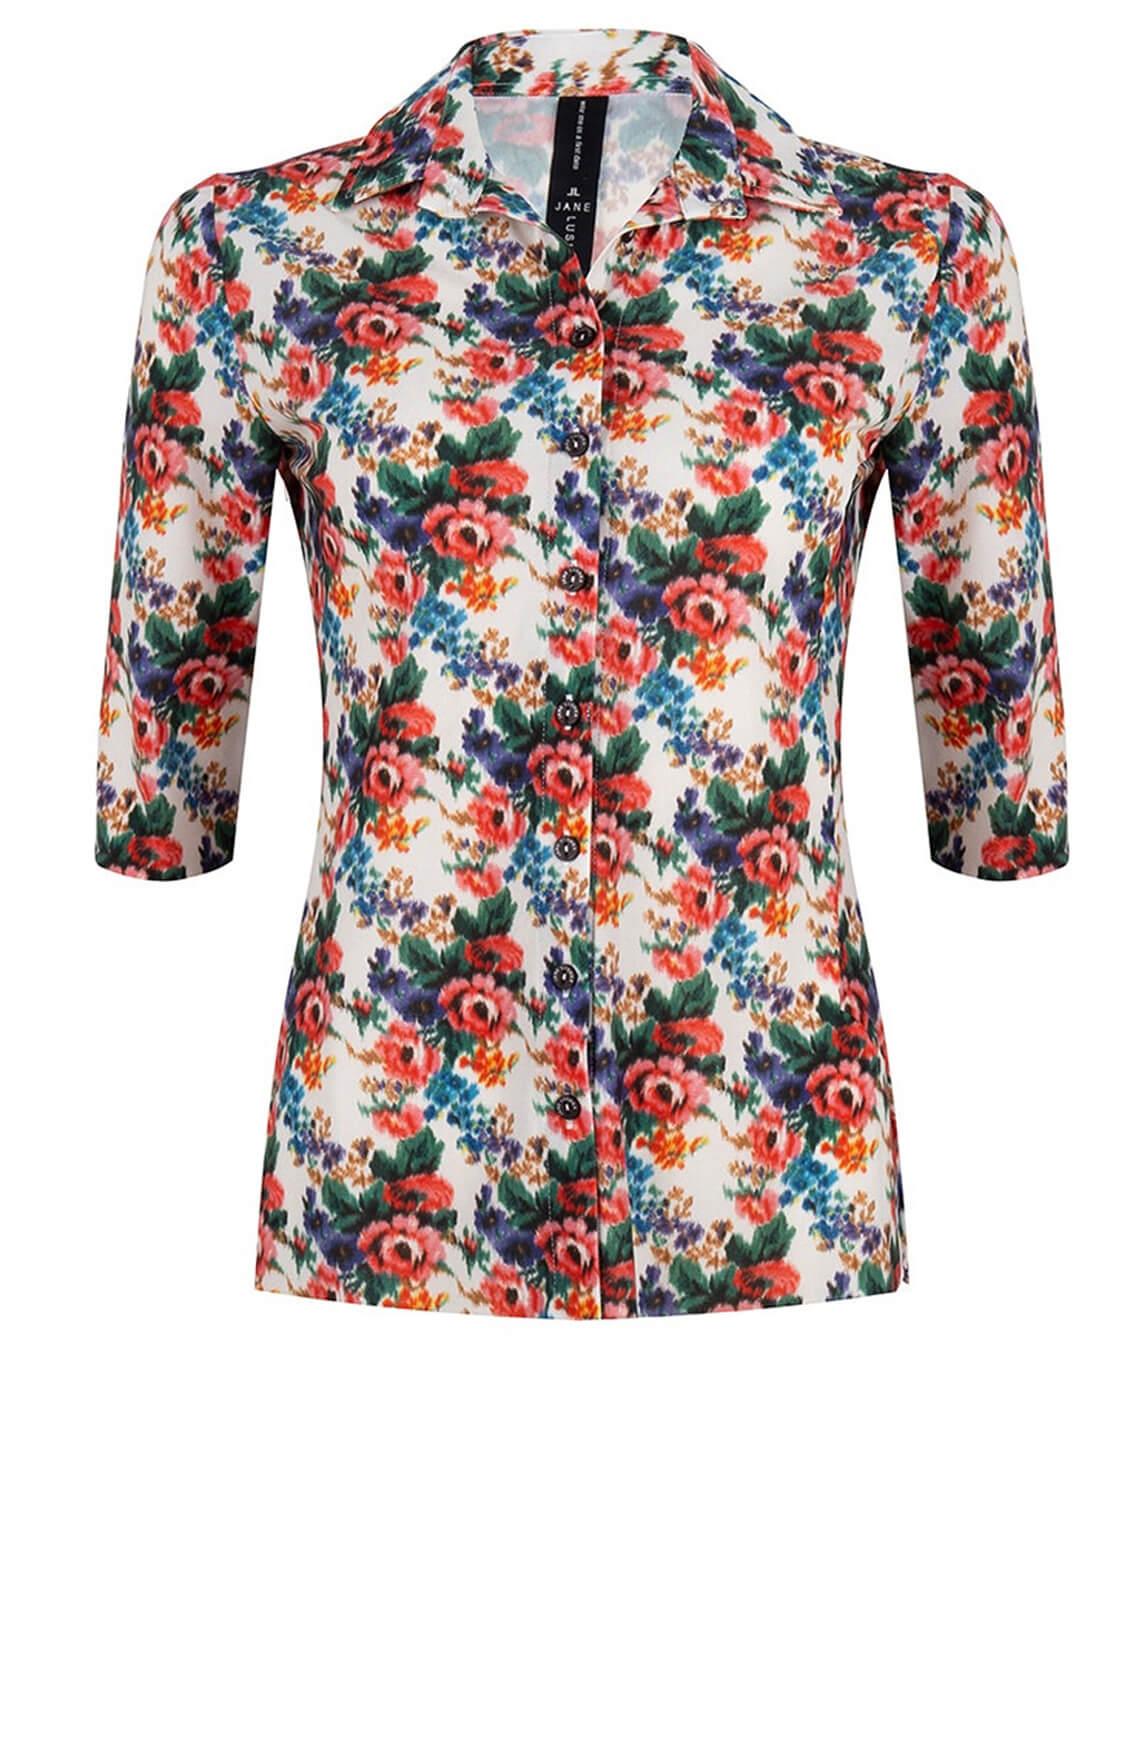 Jane Lushka Dames Debbie flower blouse wit